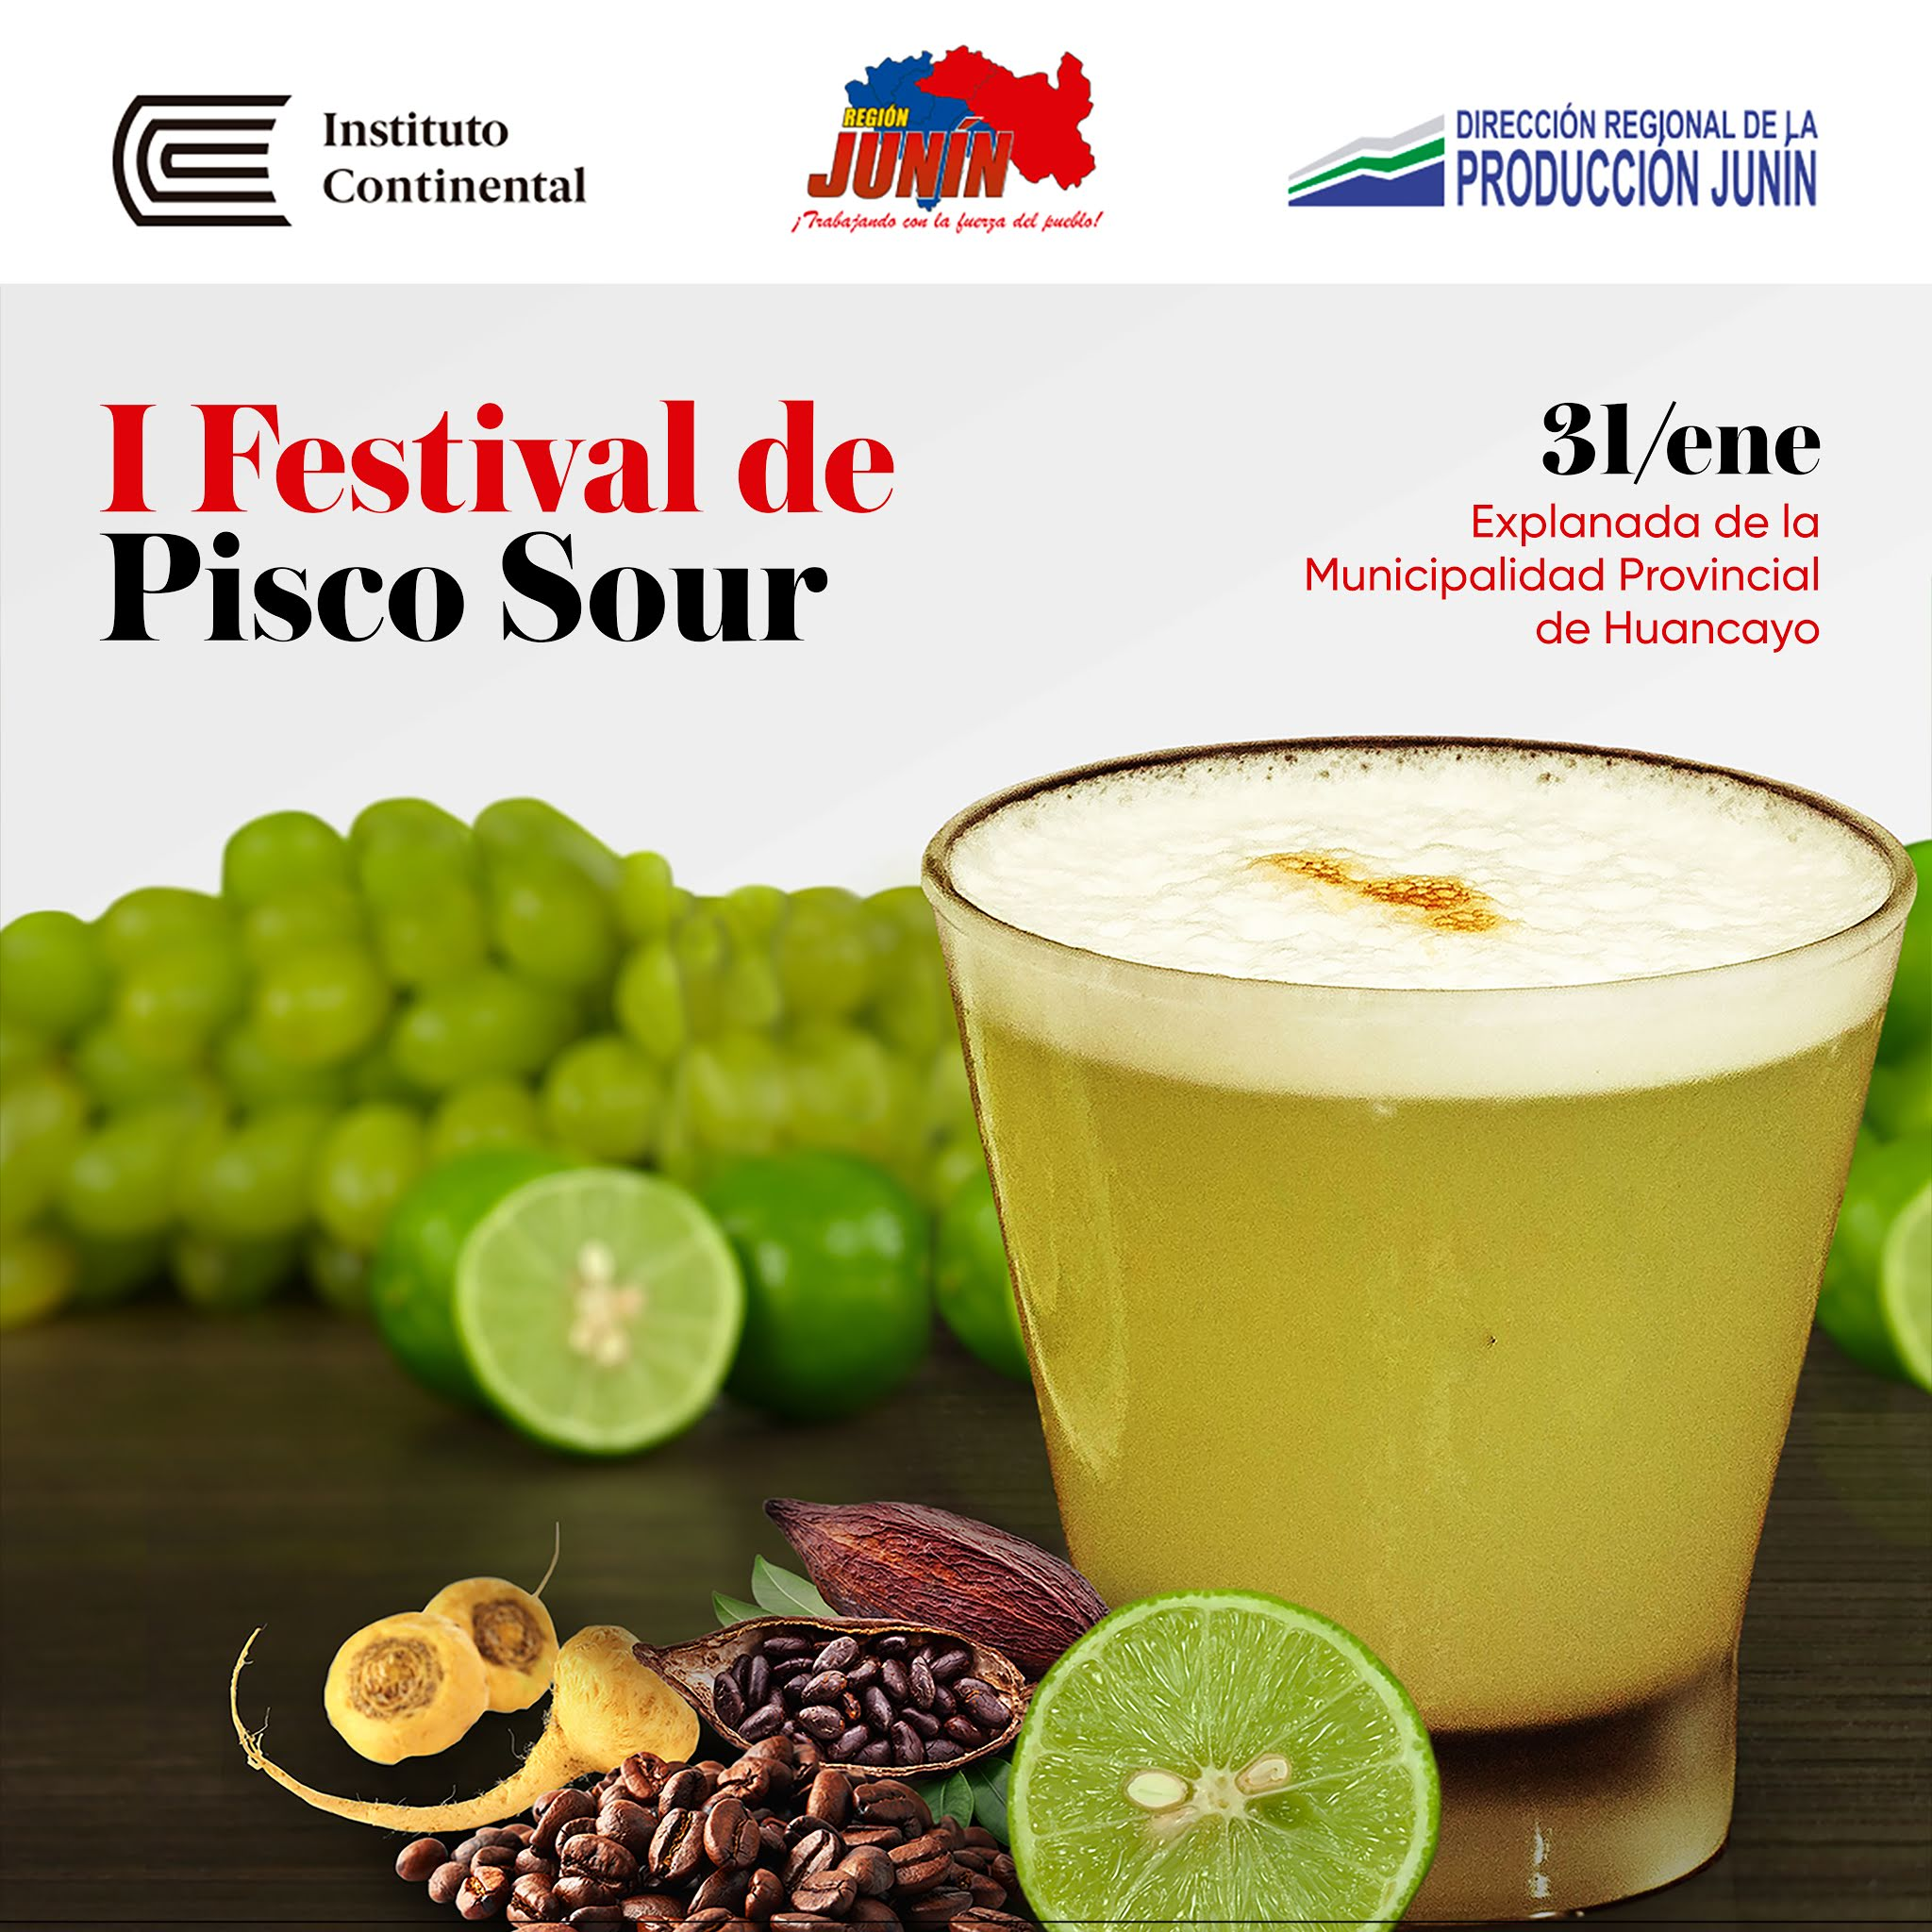 ¡I Festival del Pisco Sour! Ven a disfrutar del coctel bandera con sabor a Junín